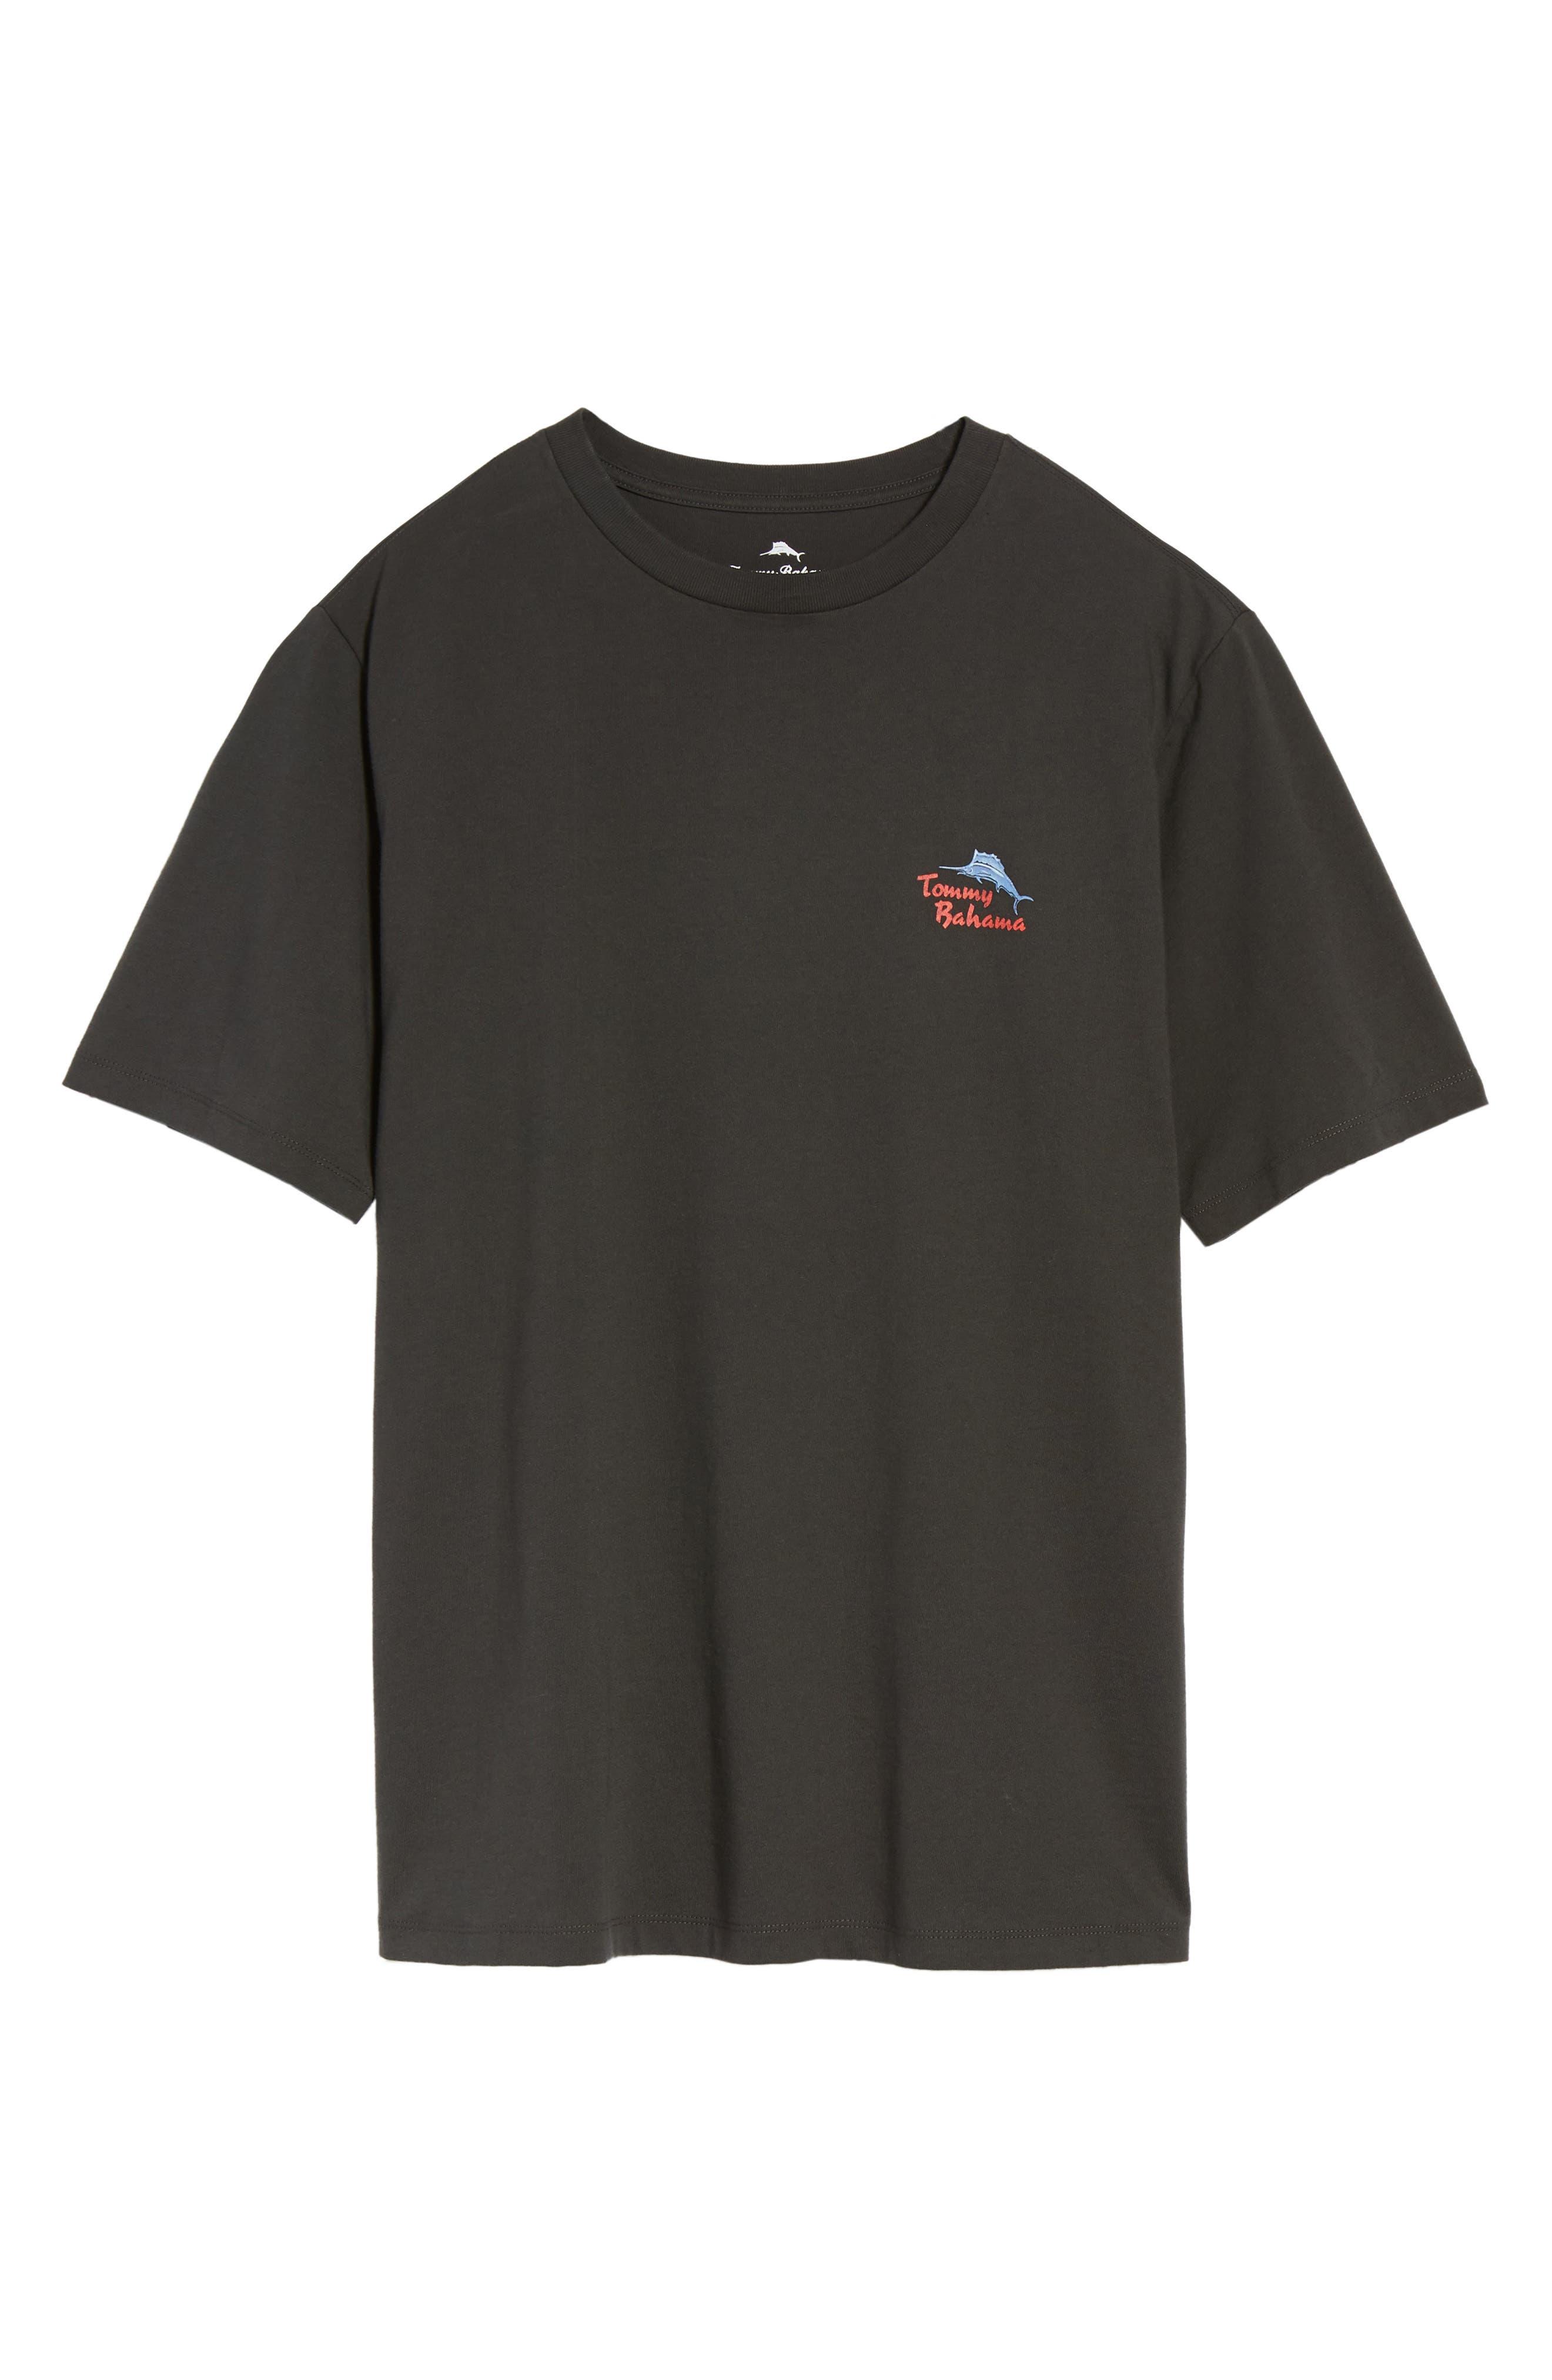 Gulp Fiction T-Shirt,                             Alternate thumbnail 6, color,                             001